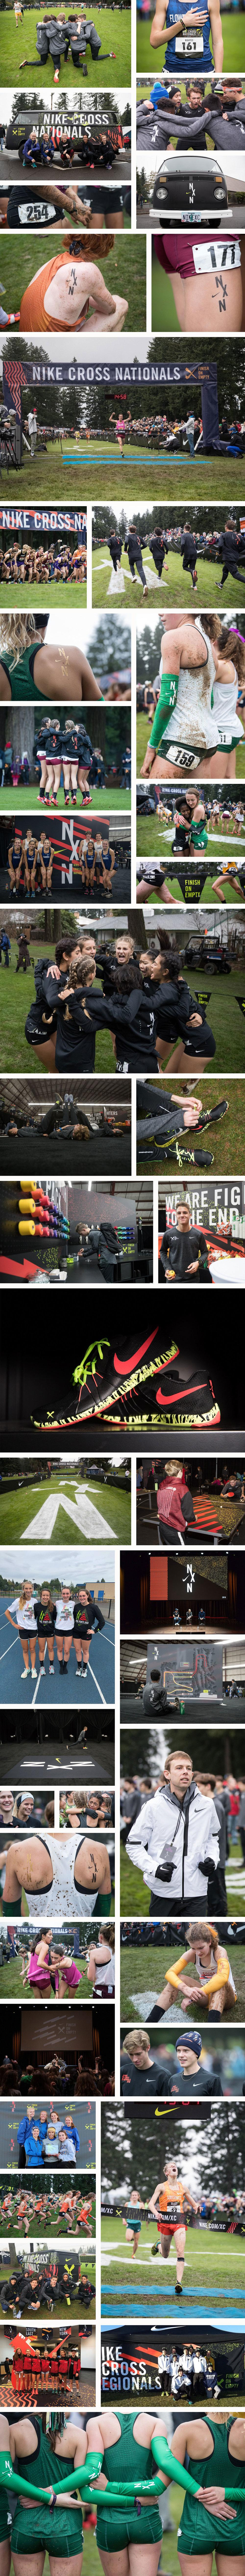 Nike_XC_zilka_photos.jpg